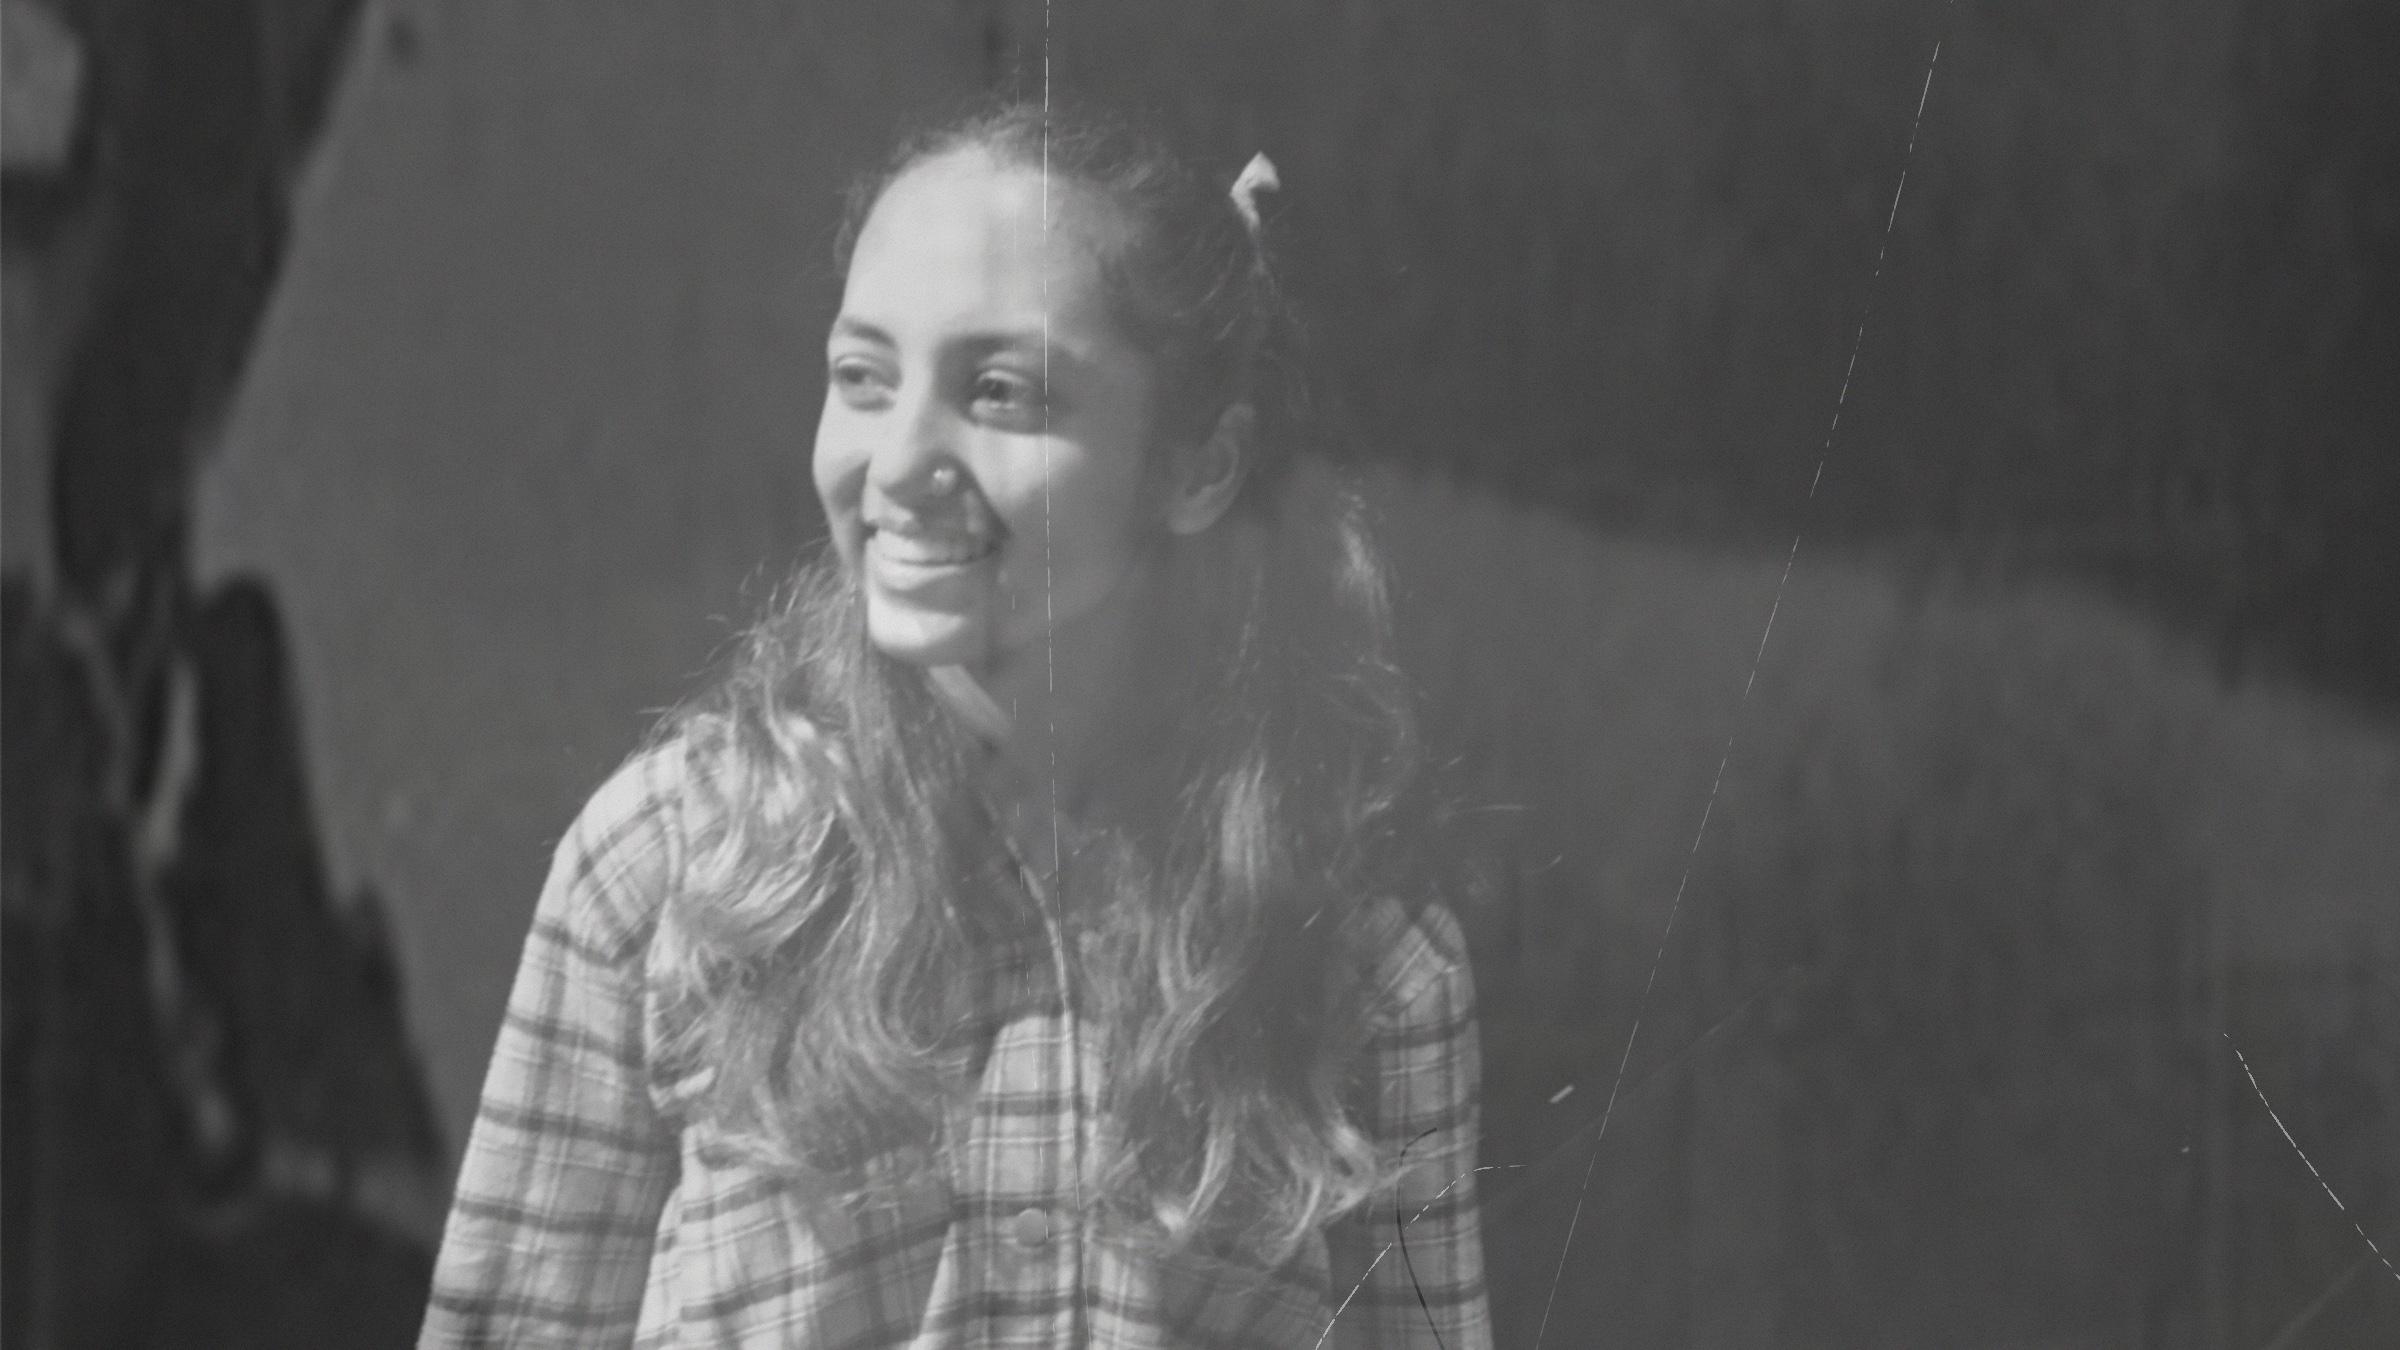 Leela Kiyawat / Dee